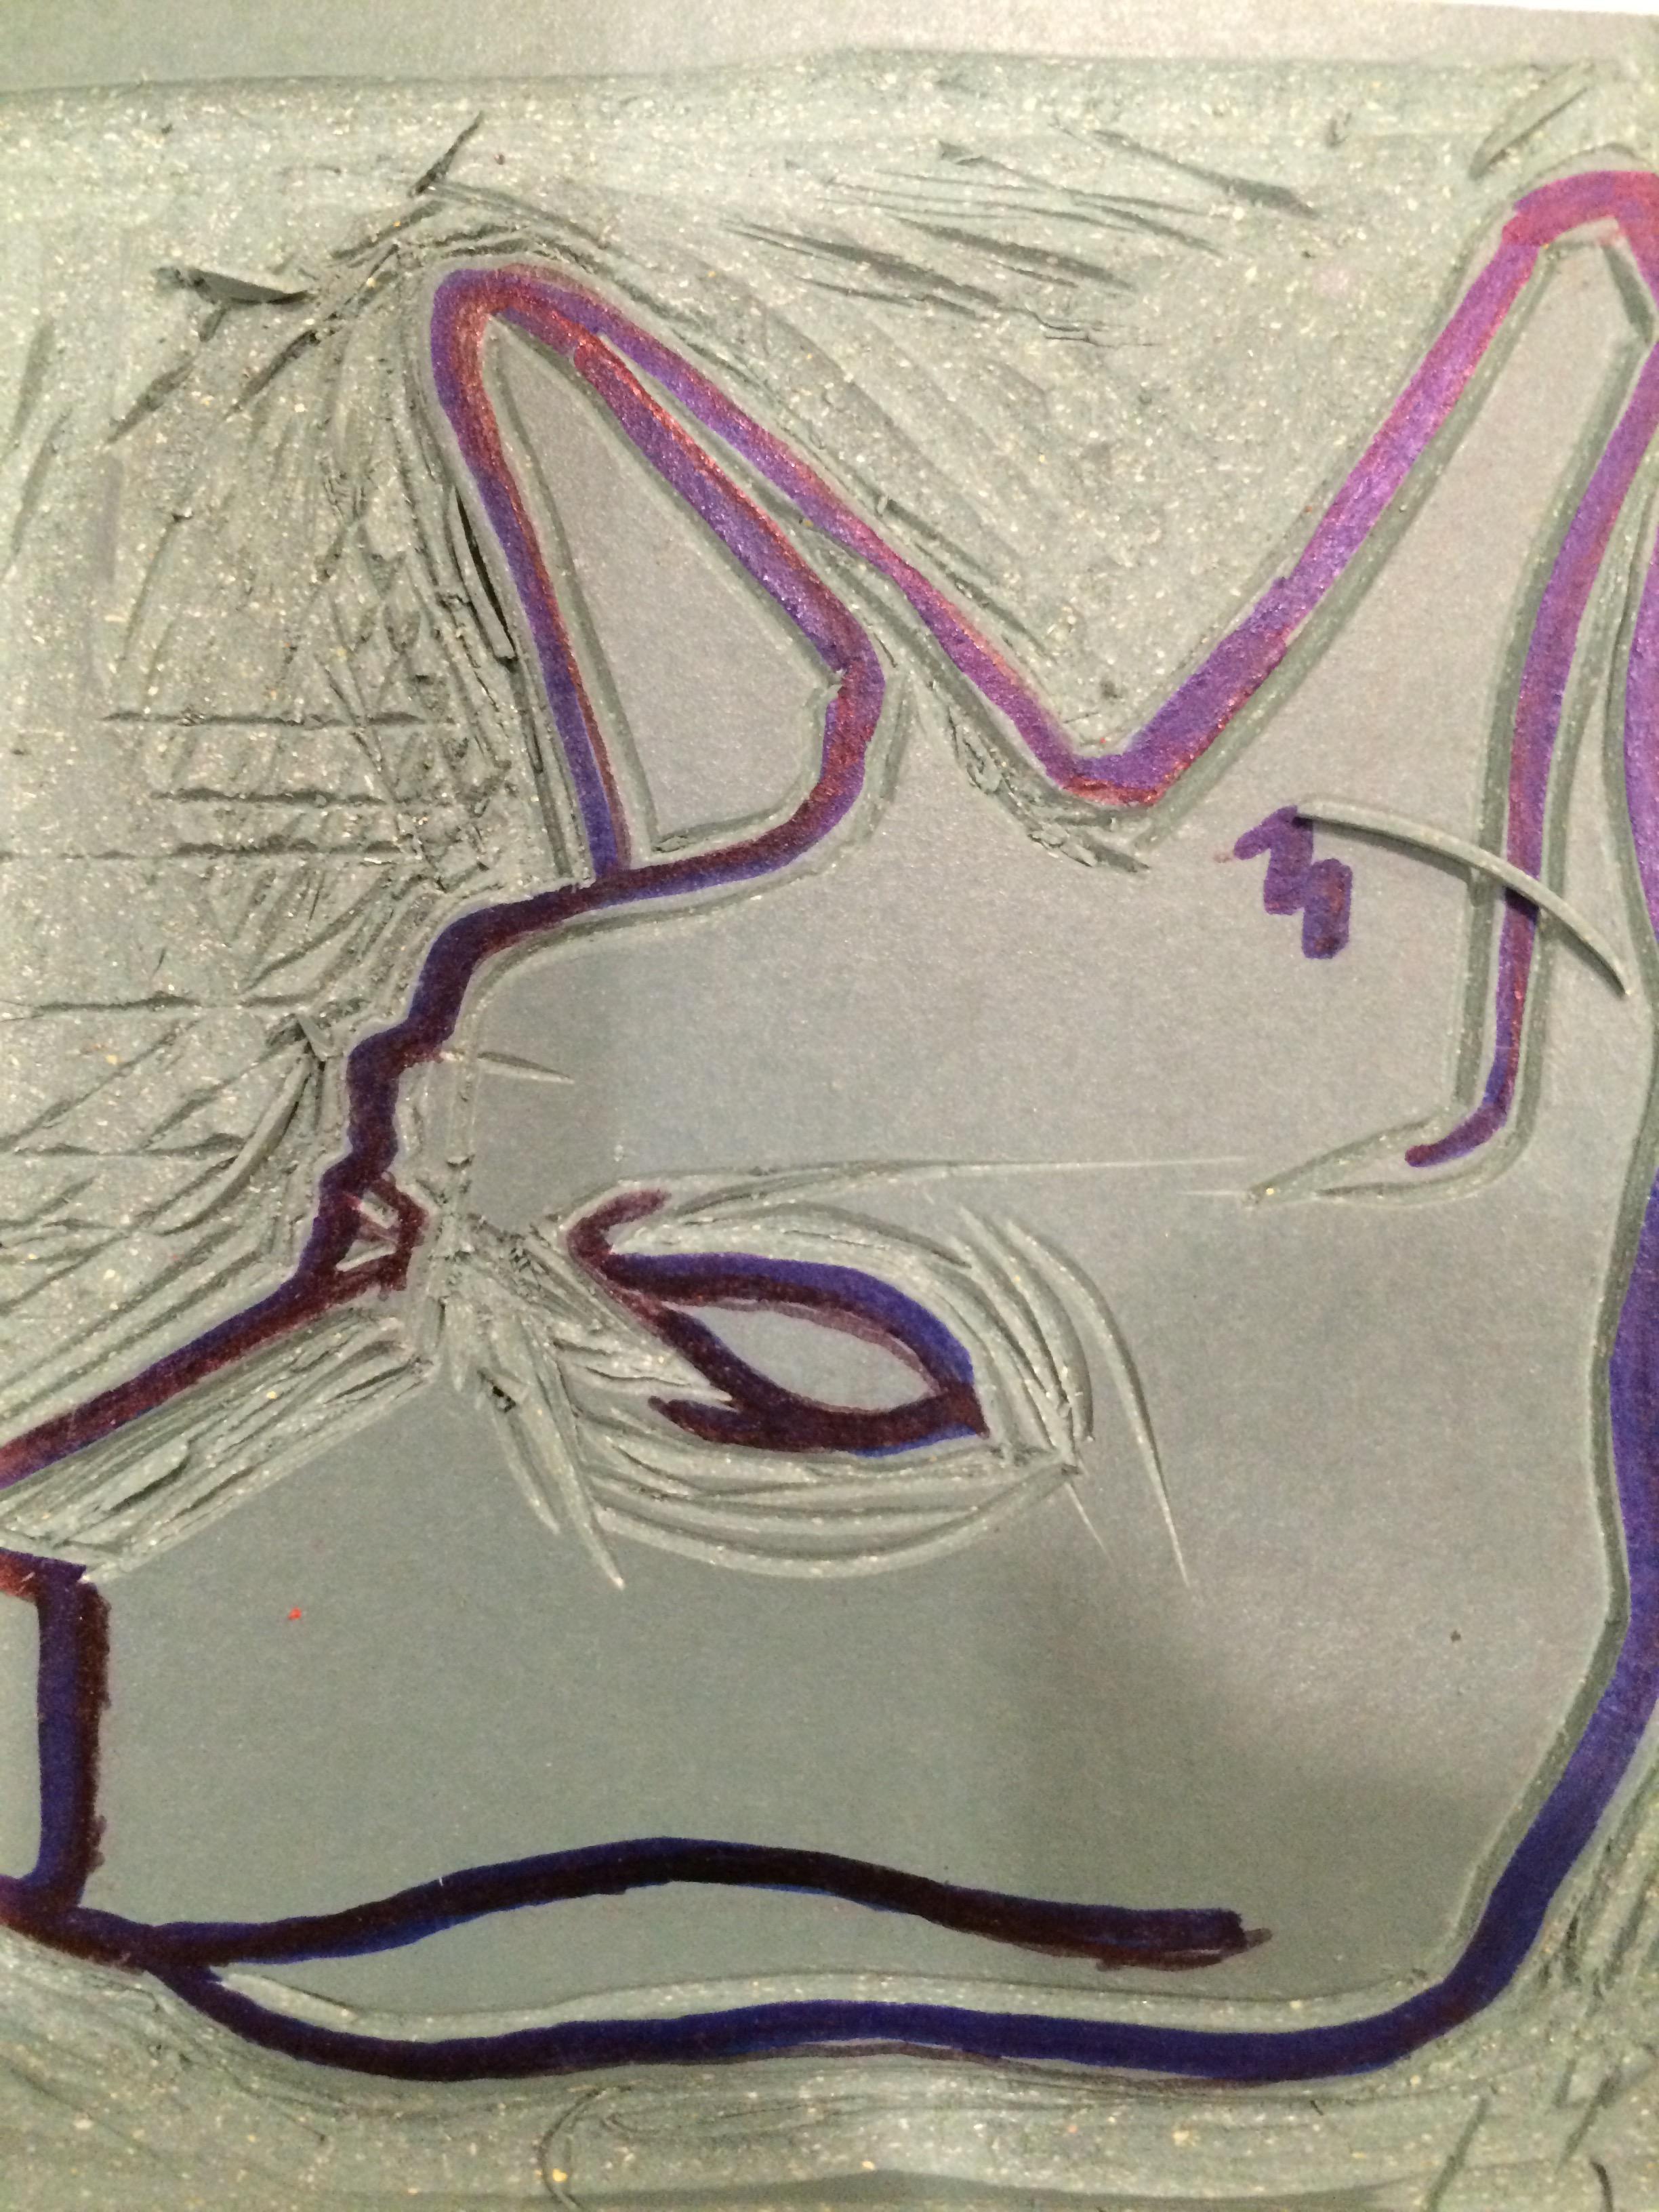 Blade carving details of dog into linoleum plate.